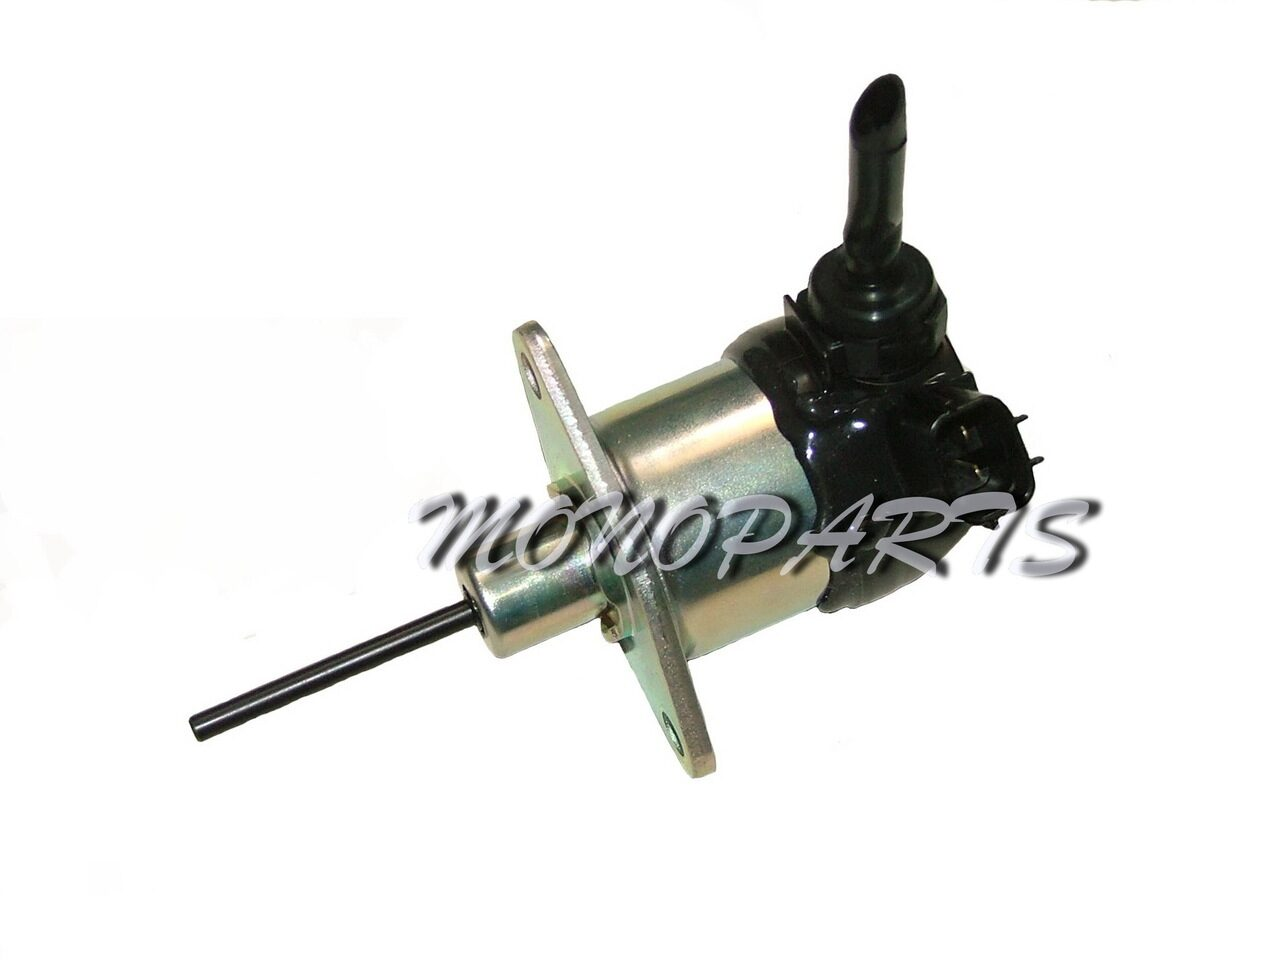 Kubota D722 Diesel Engine Parts